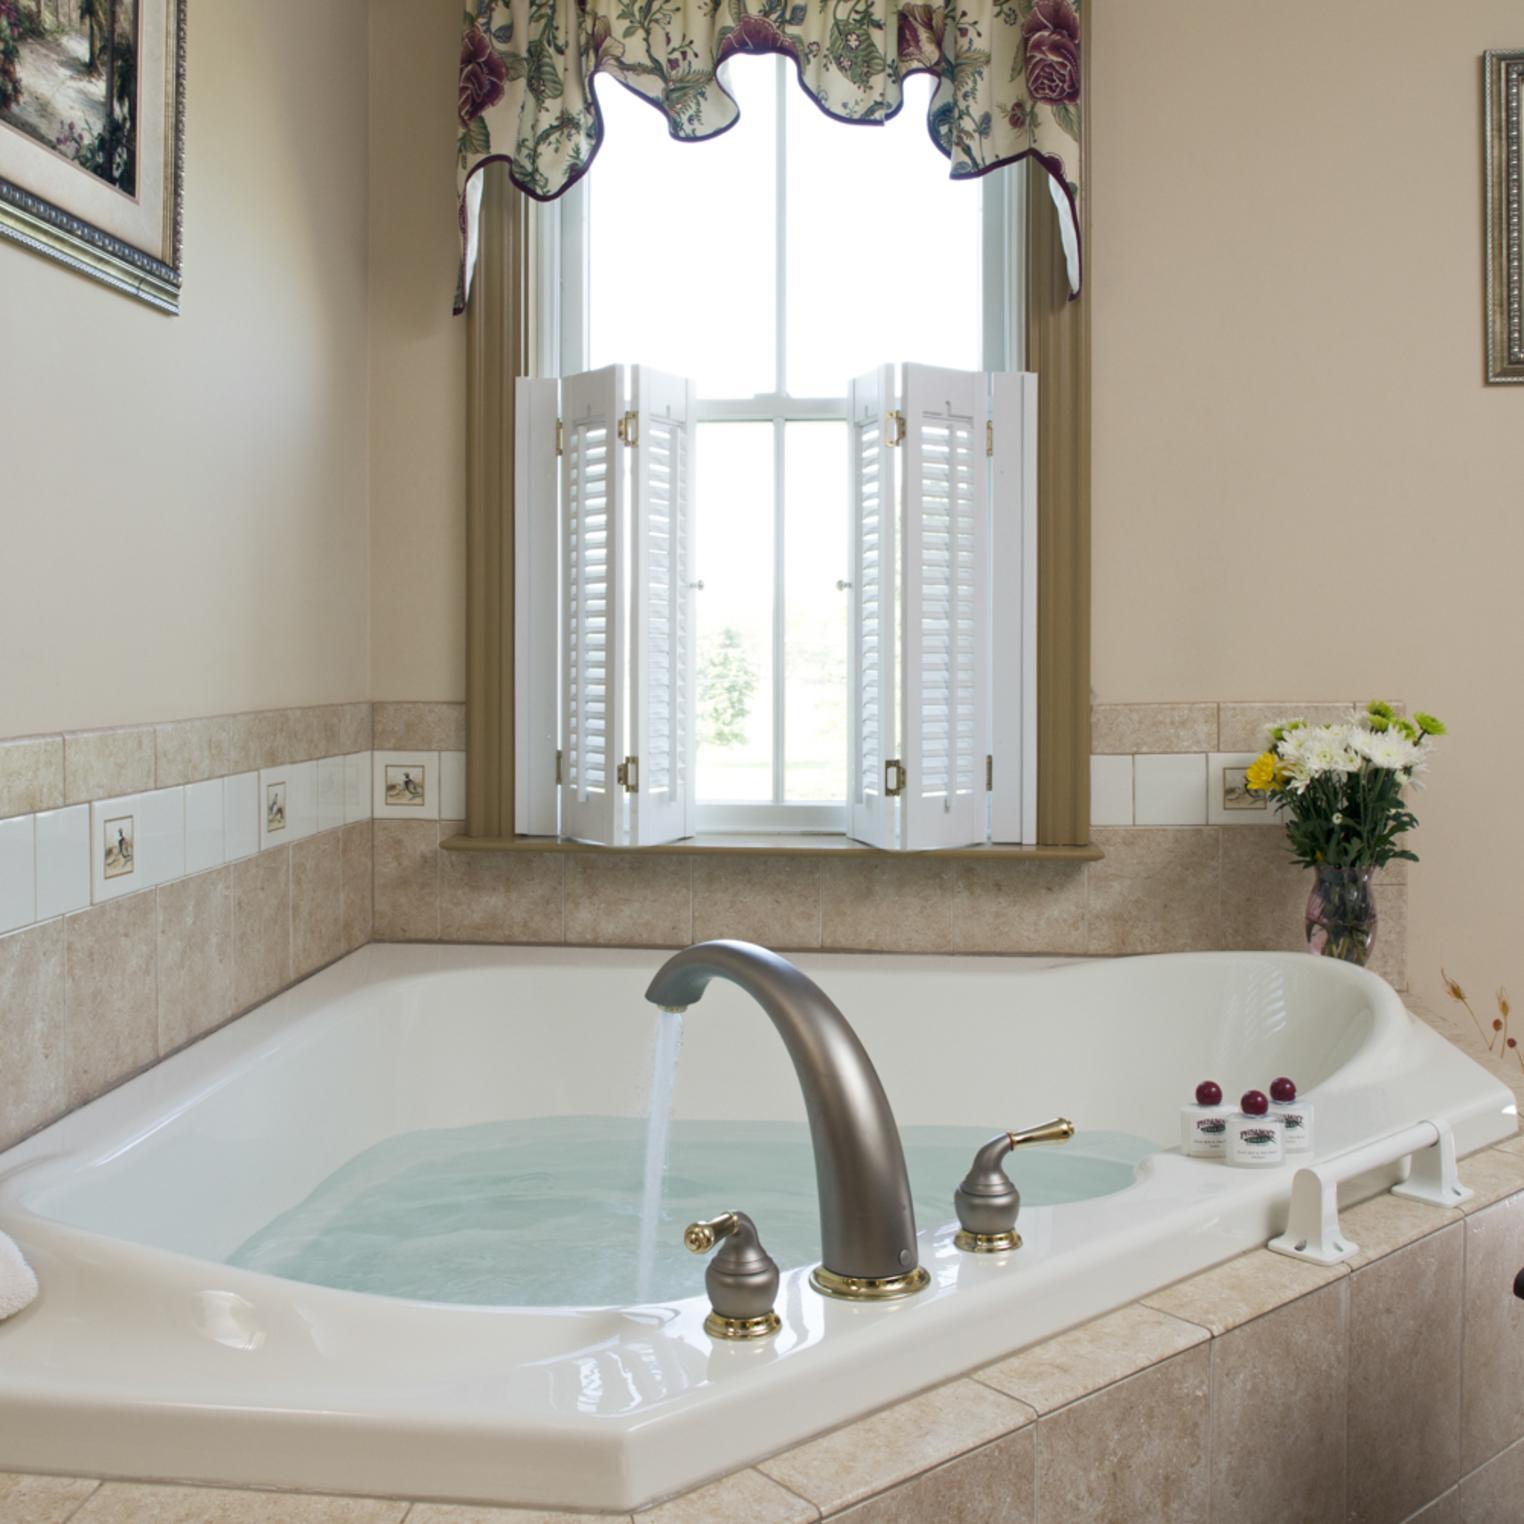 Luxury Spa Bathtub